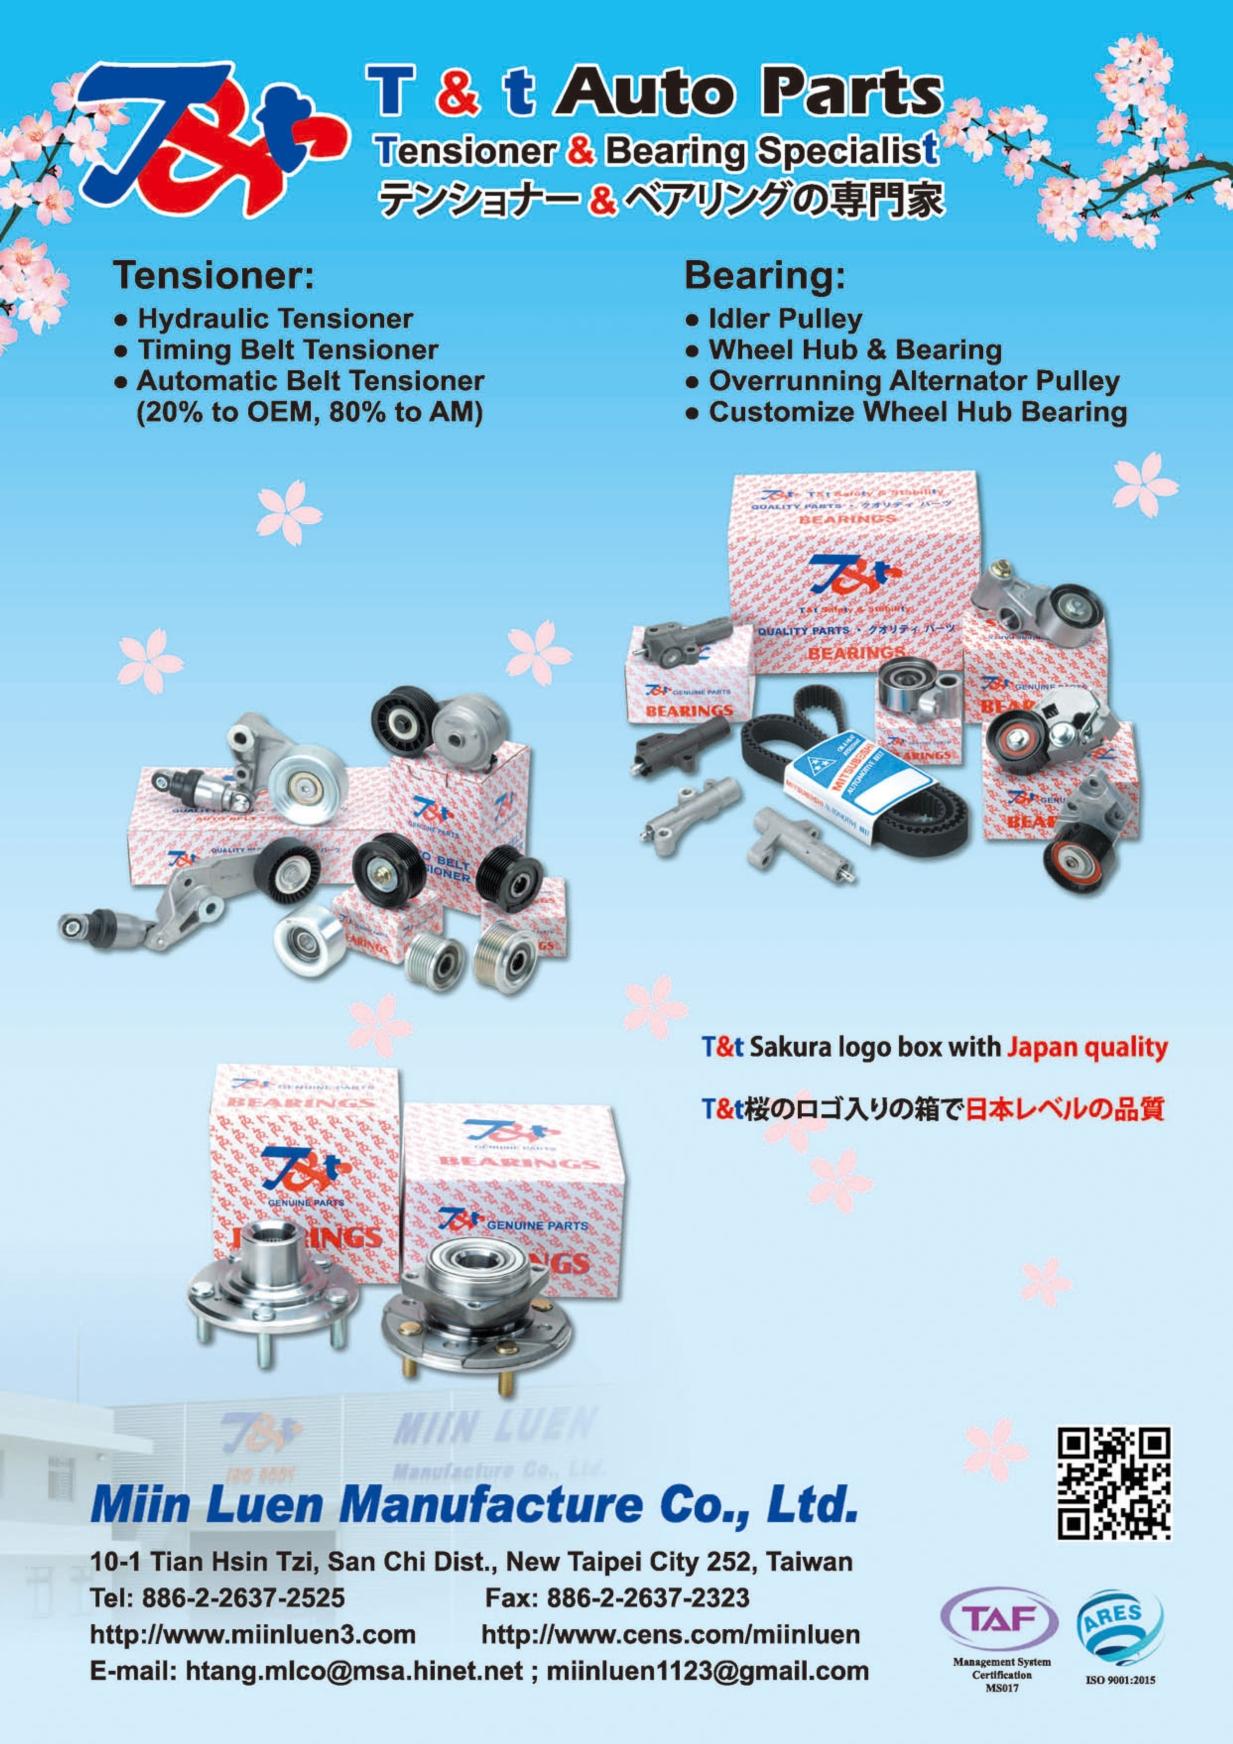 TTG-Taiwan Transportation Equipment Guide MIIN LUEN MANUFACTURE CO., LTD.